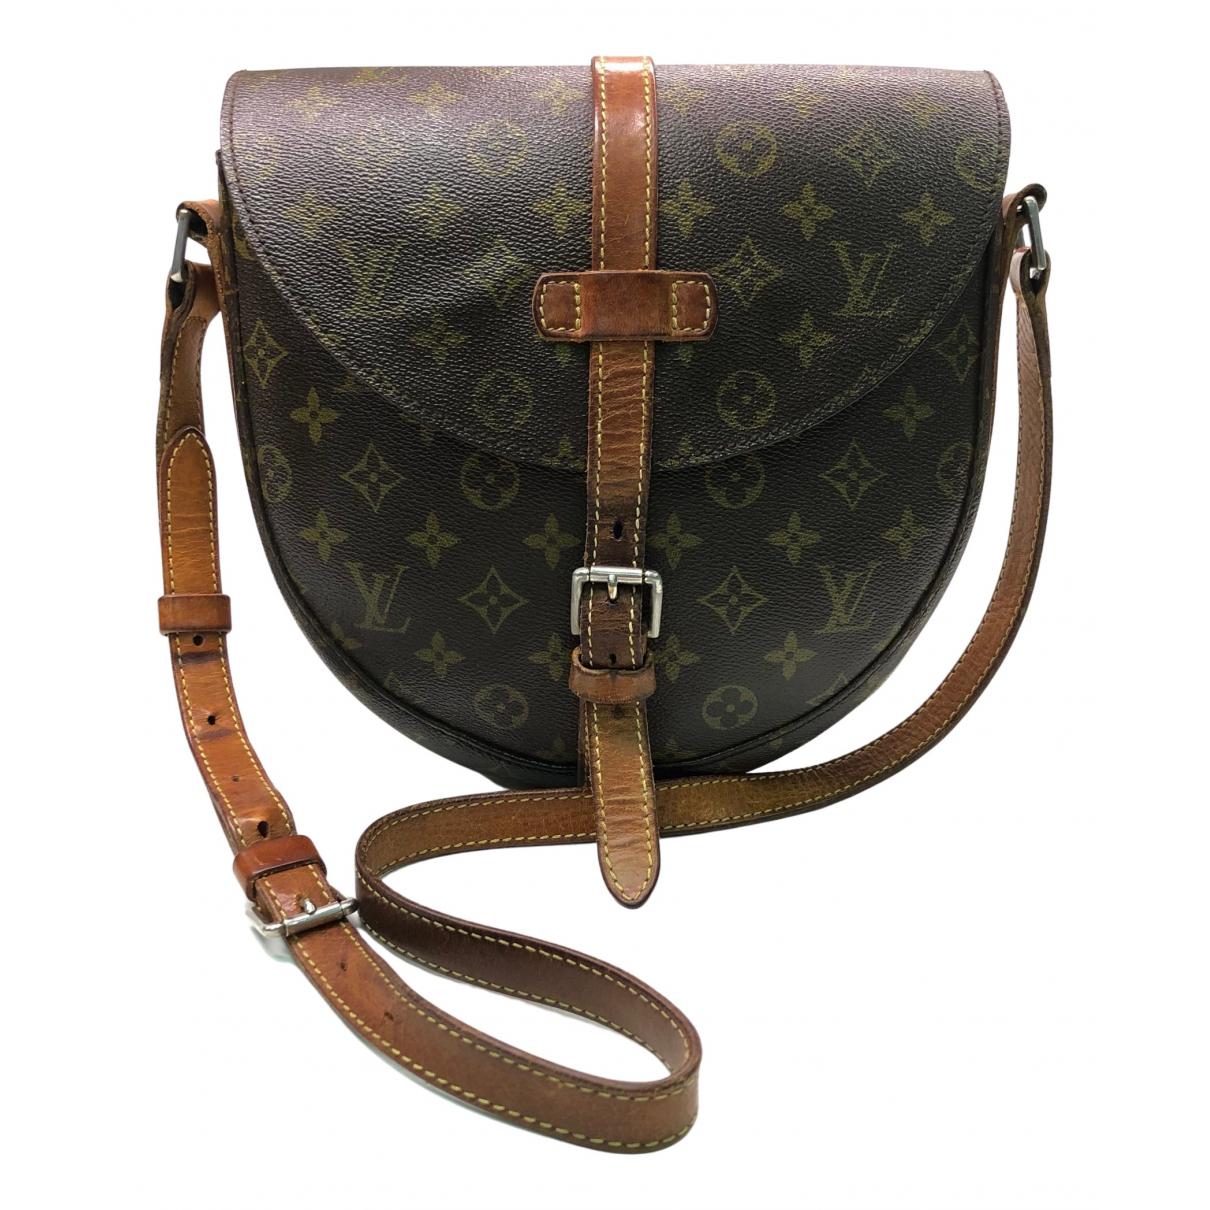 Louis Vuitton Chantilly Handtasche in  Braun Leinen